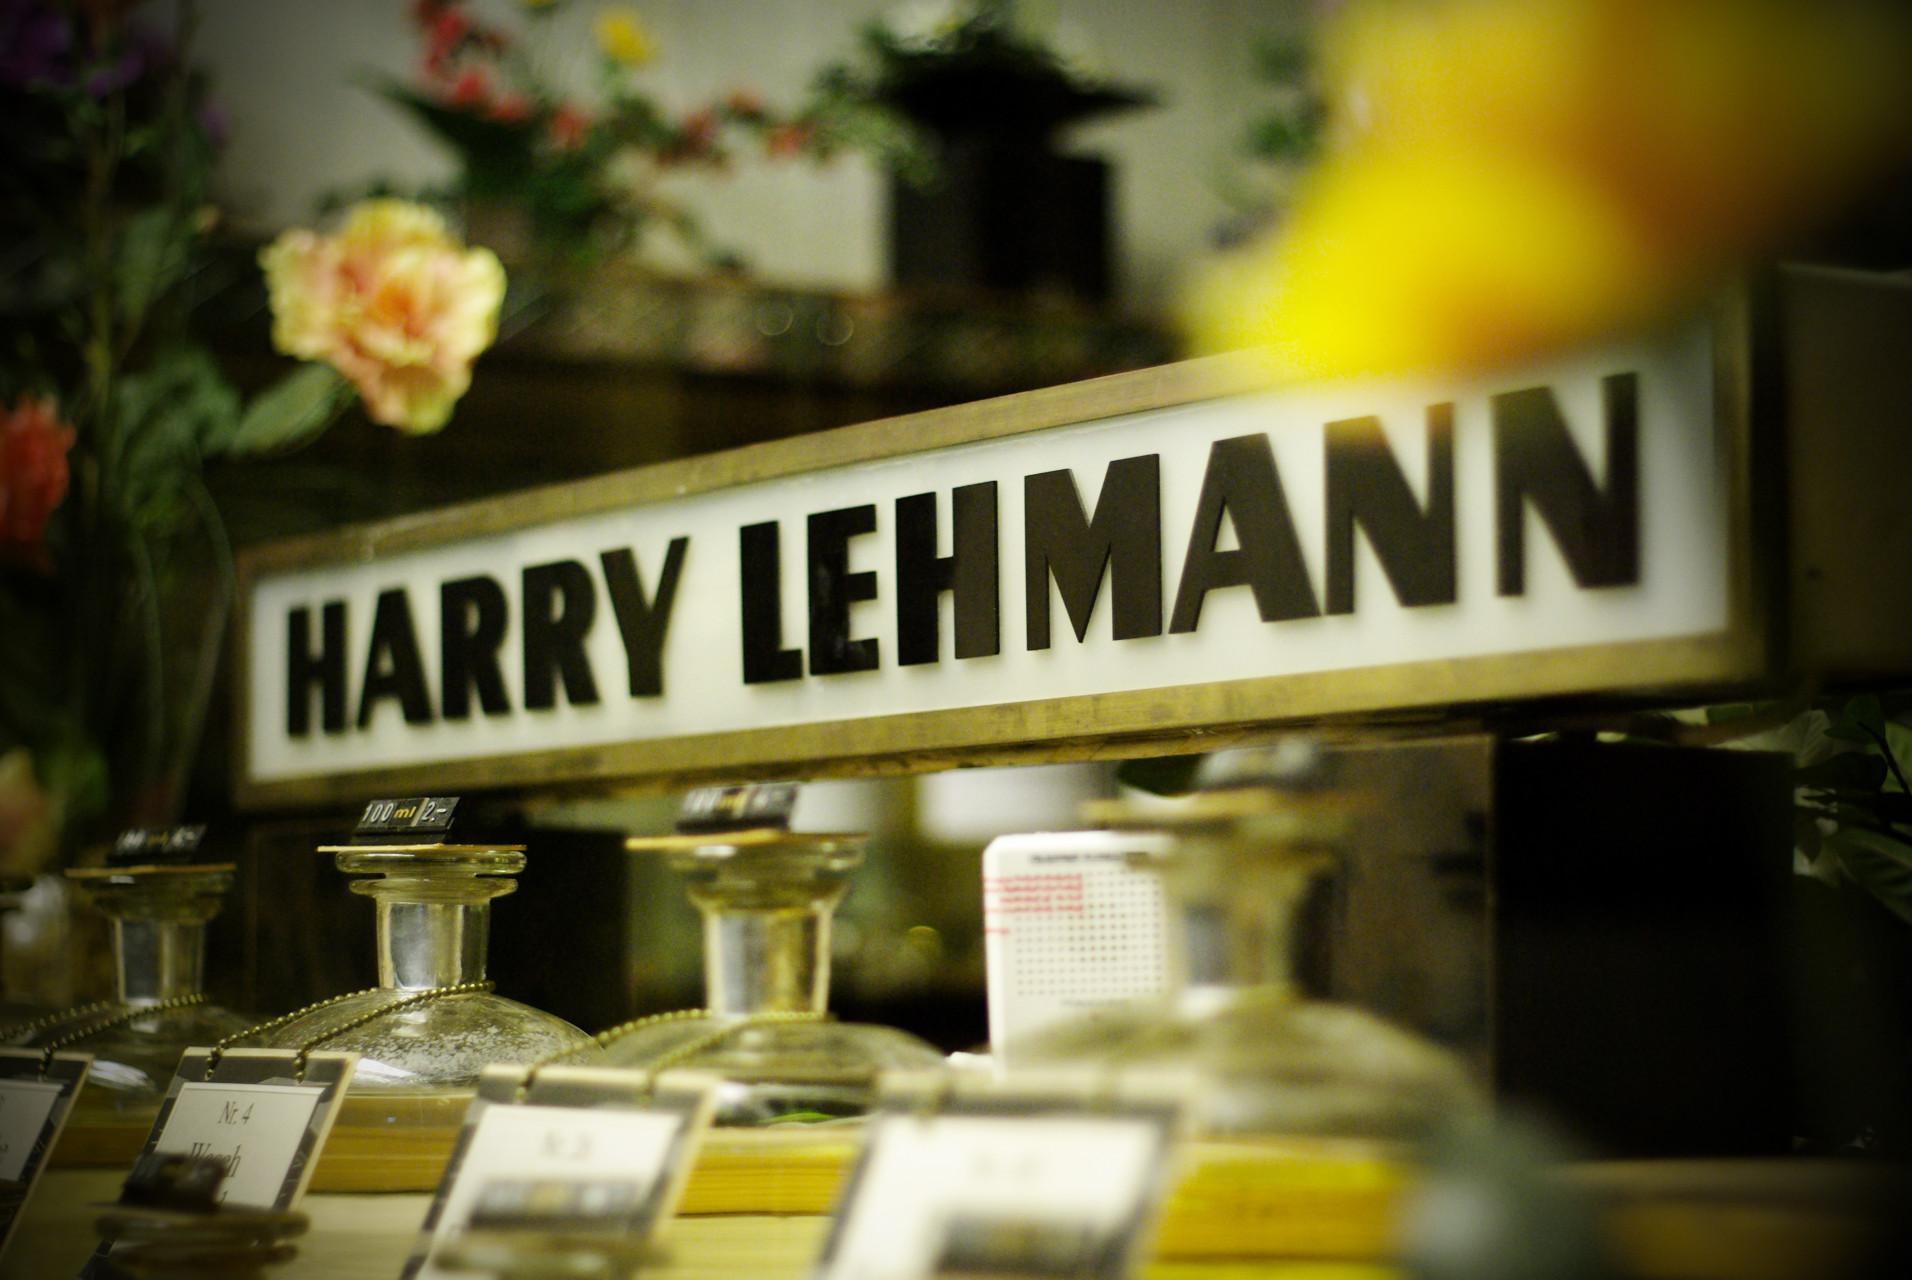 Harry Lehmann